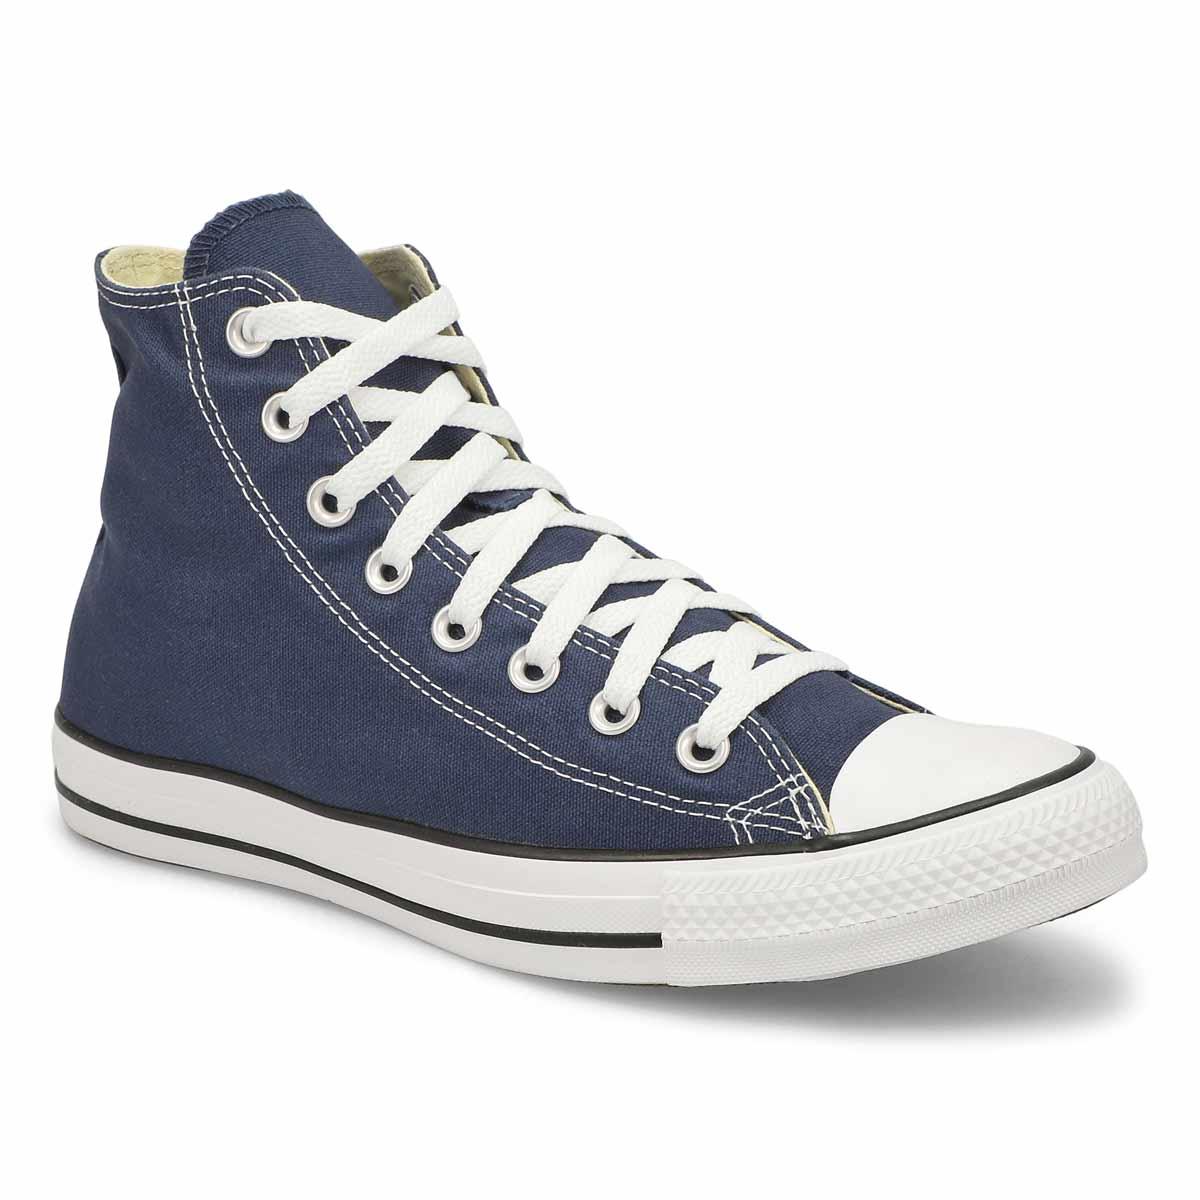 Men's CHUCK TAYLOR CORE HI navy sneakers